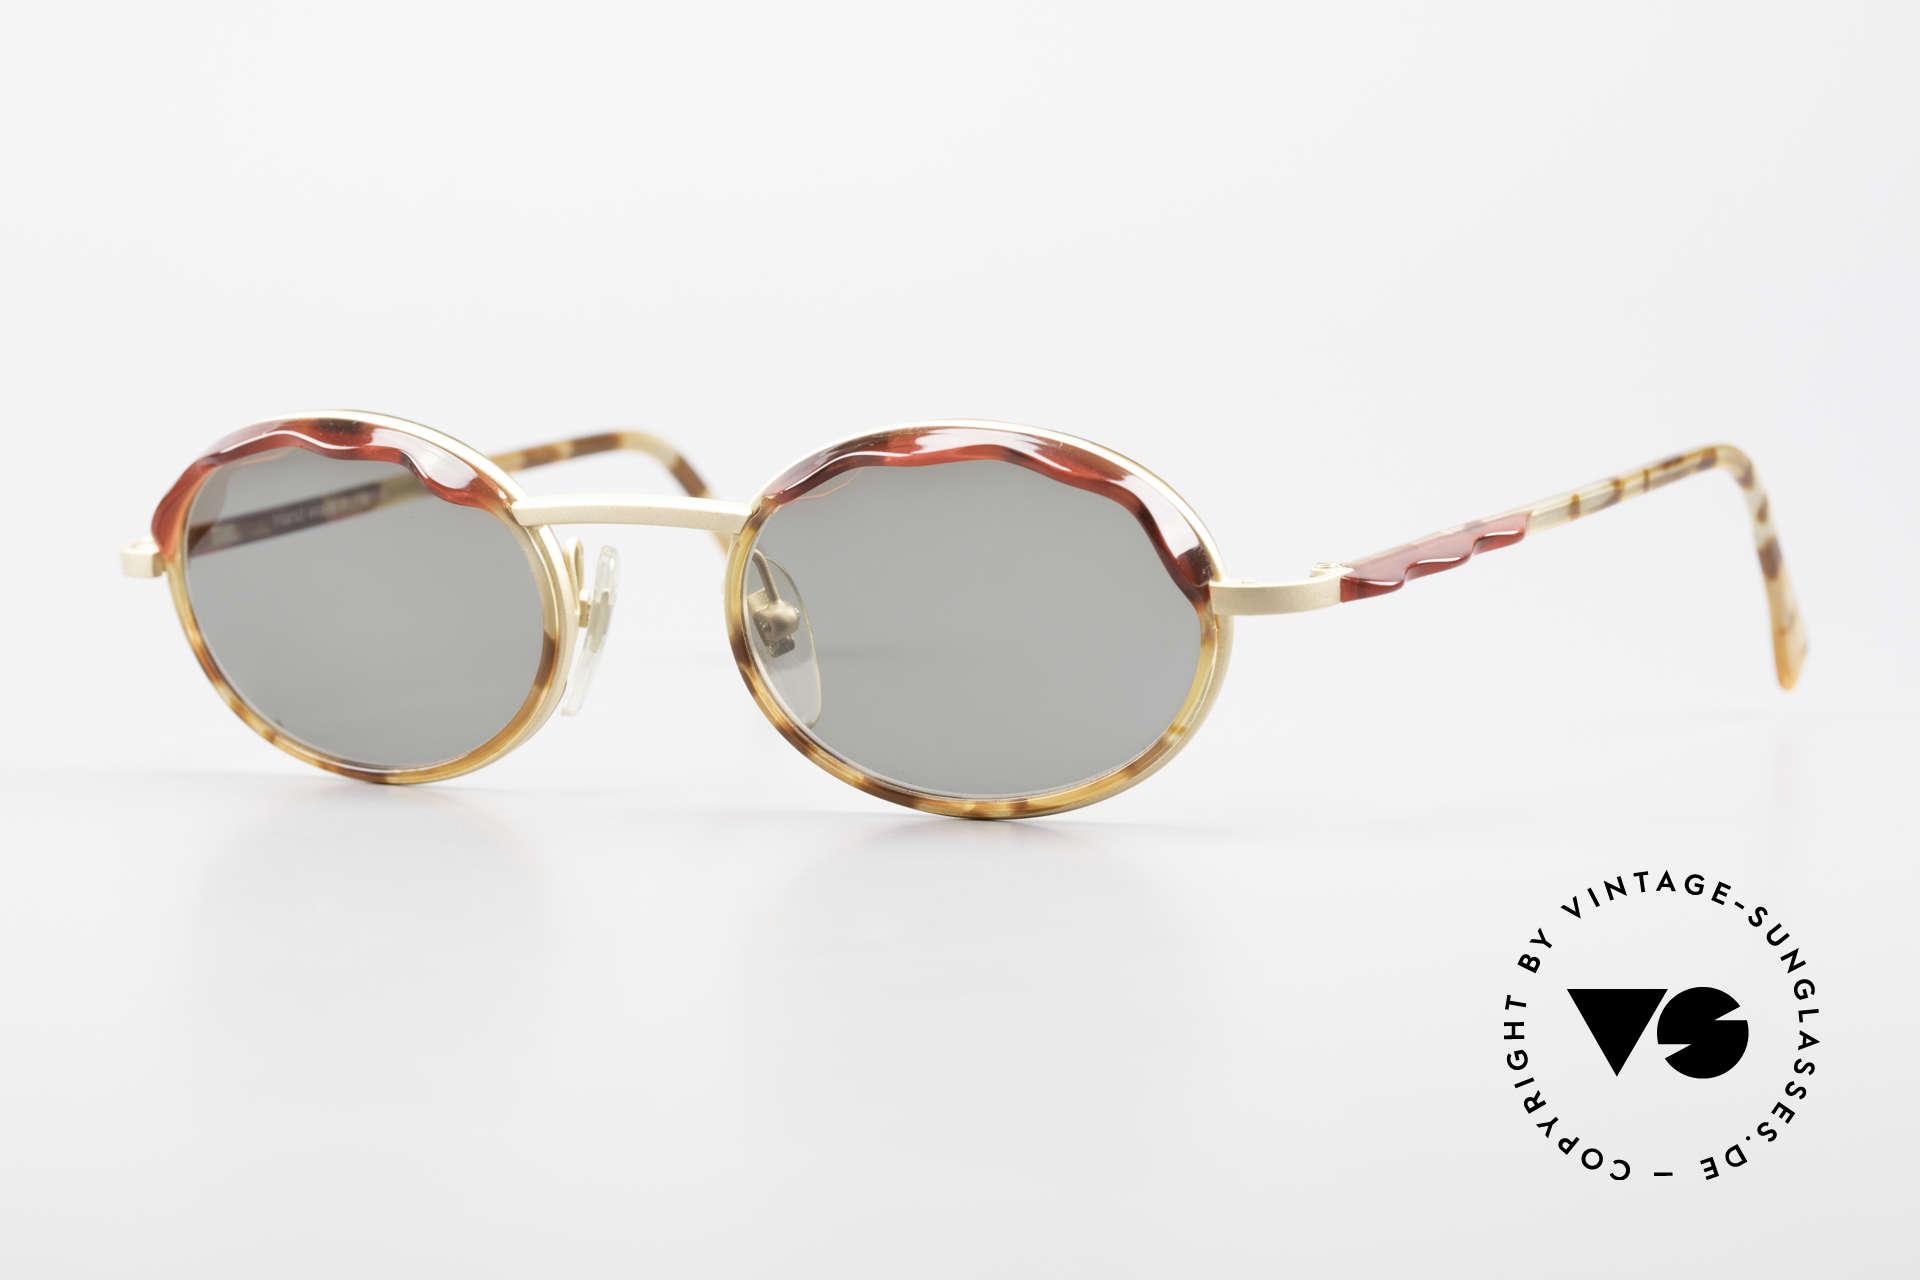 Alain Mikli 2149 / 04001 Oval Vintage Ladies Shades, delightful vintage designer sunglasses by Alain Mikli, Made for Women